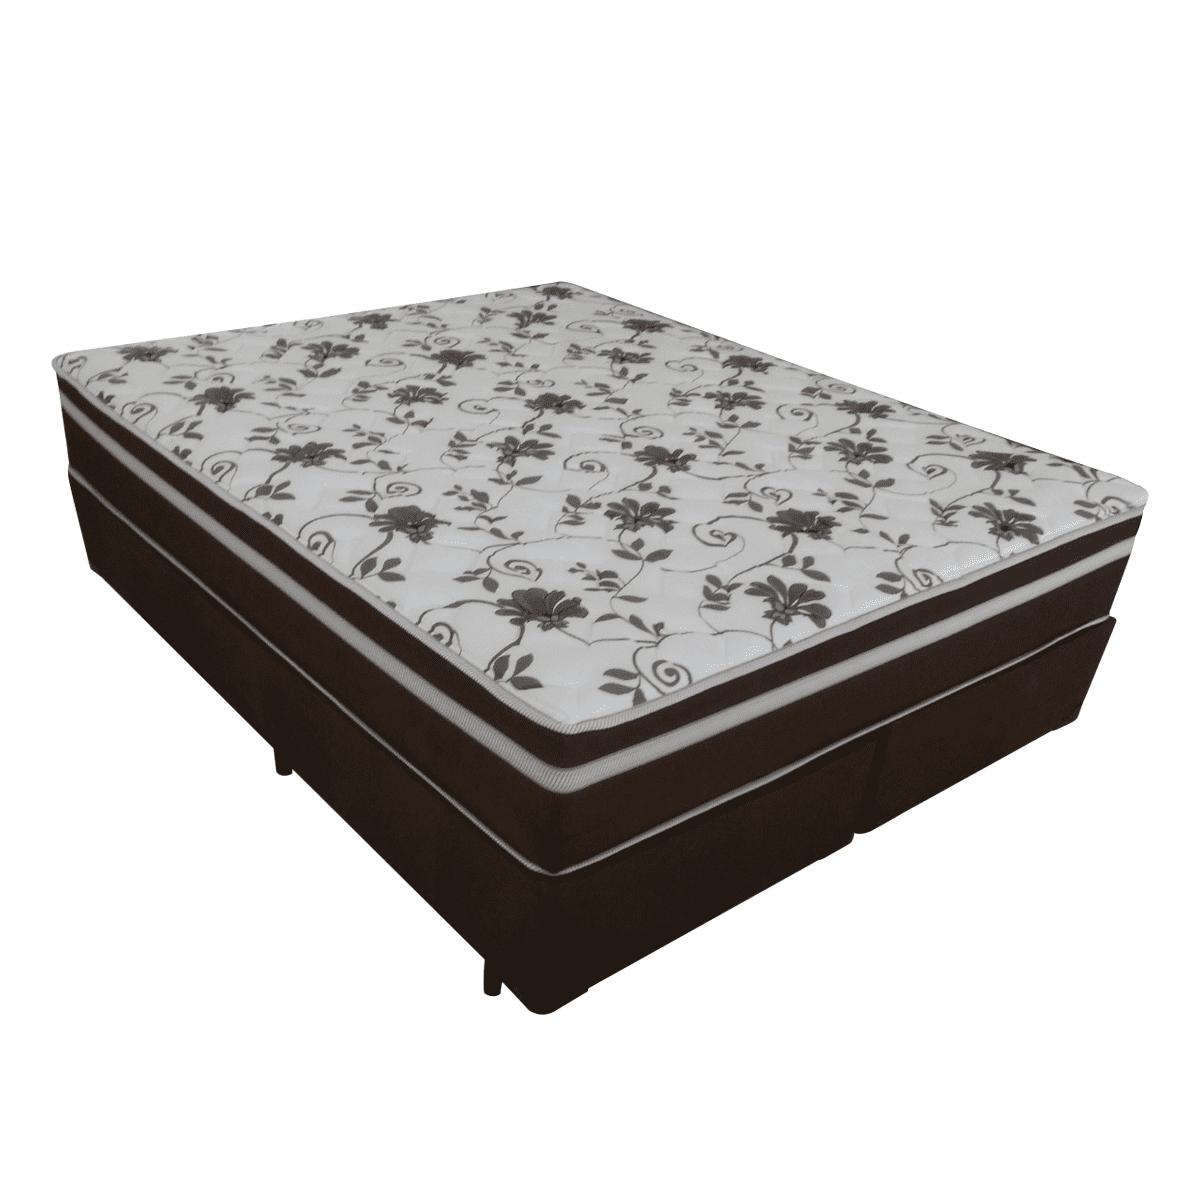 Cama Box + Colchão de Molas Pocket Queen Branco/Marrom New Vienna Anjos